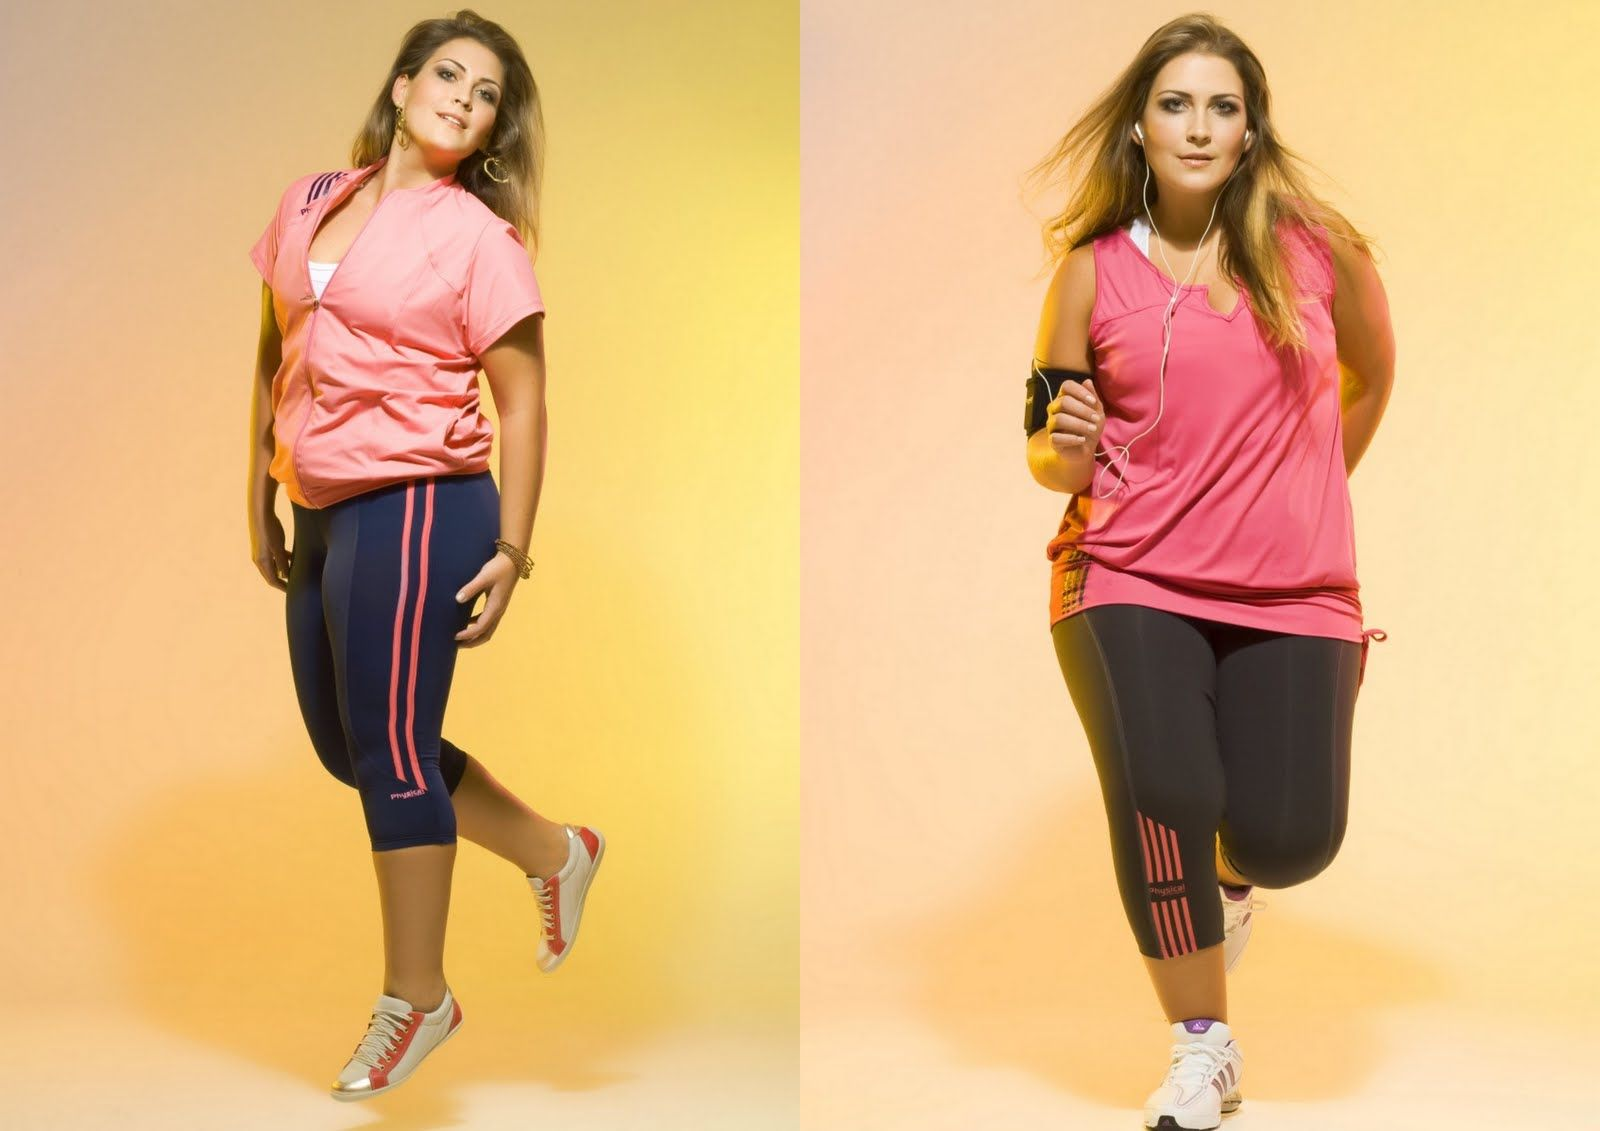 0a541a5b41f4 Onde encontrar moda fitness plus size   Plus size stylish clothes ...